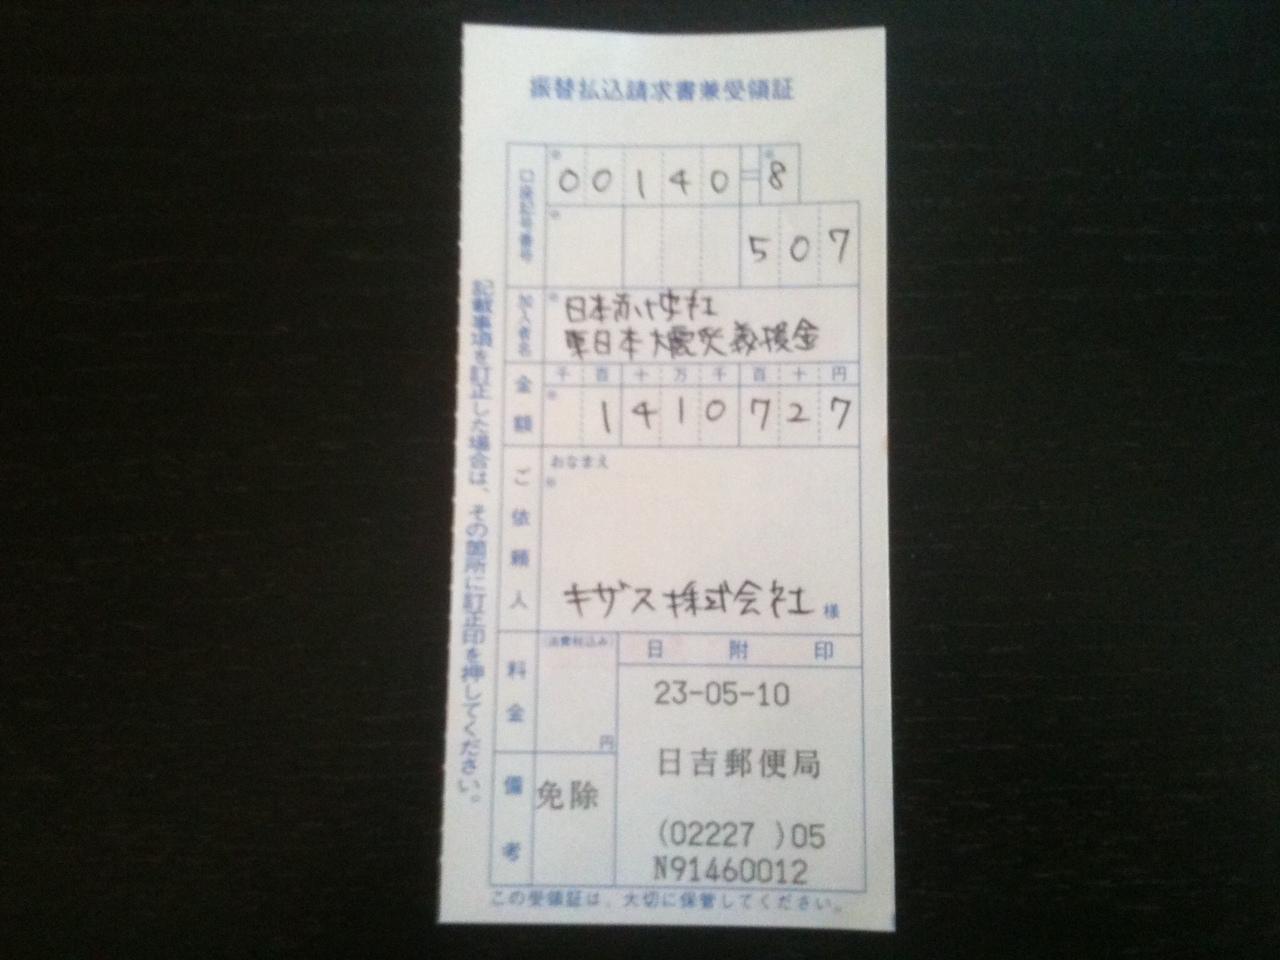 http://1to8.net/blog/wojapan/gienkin.JPG